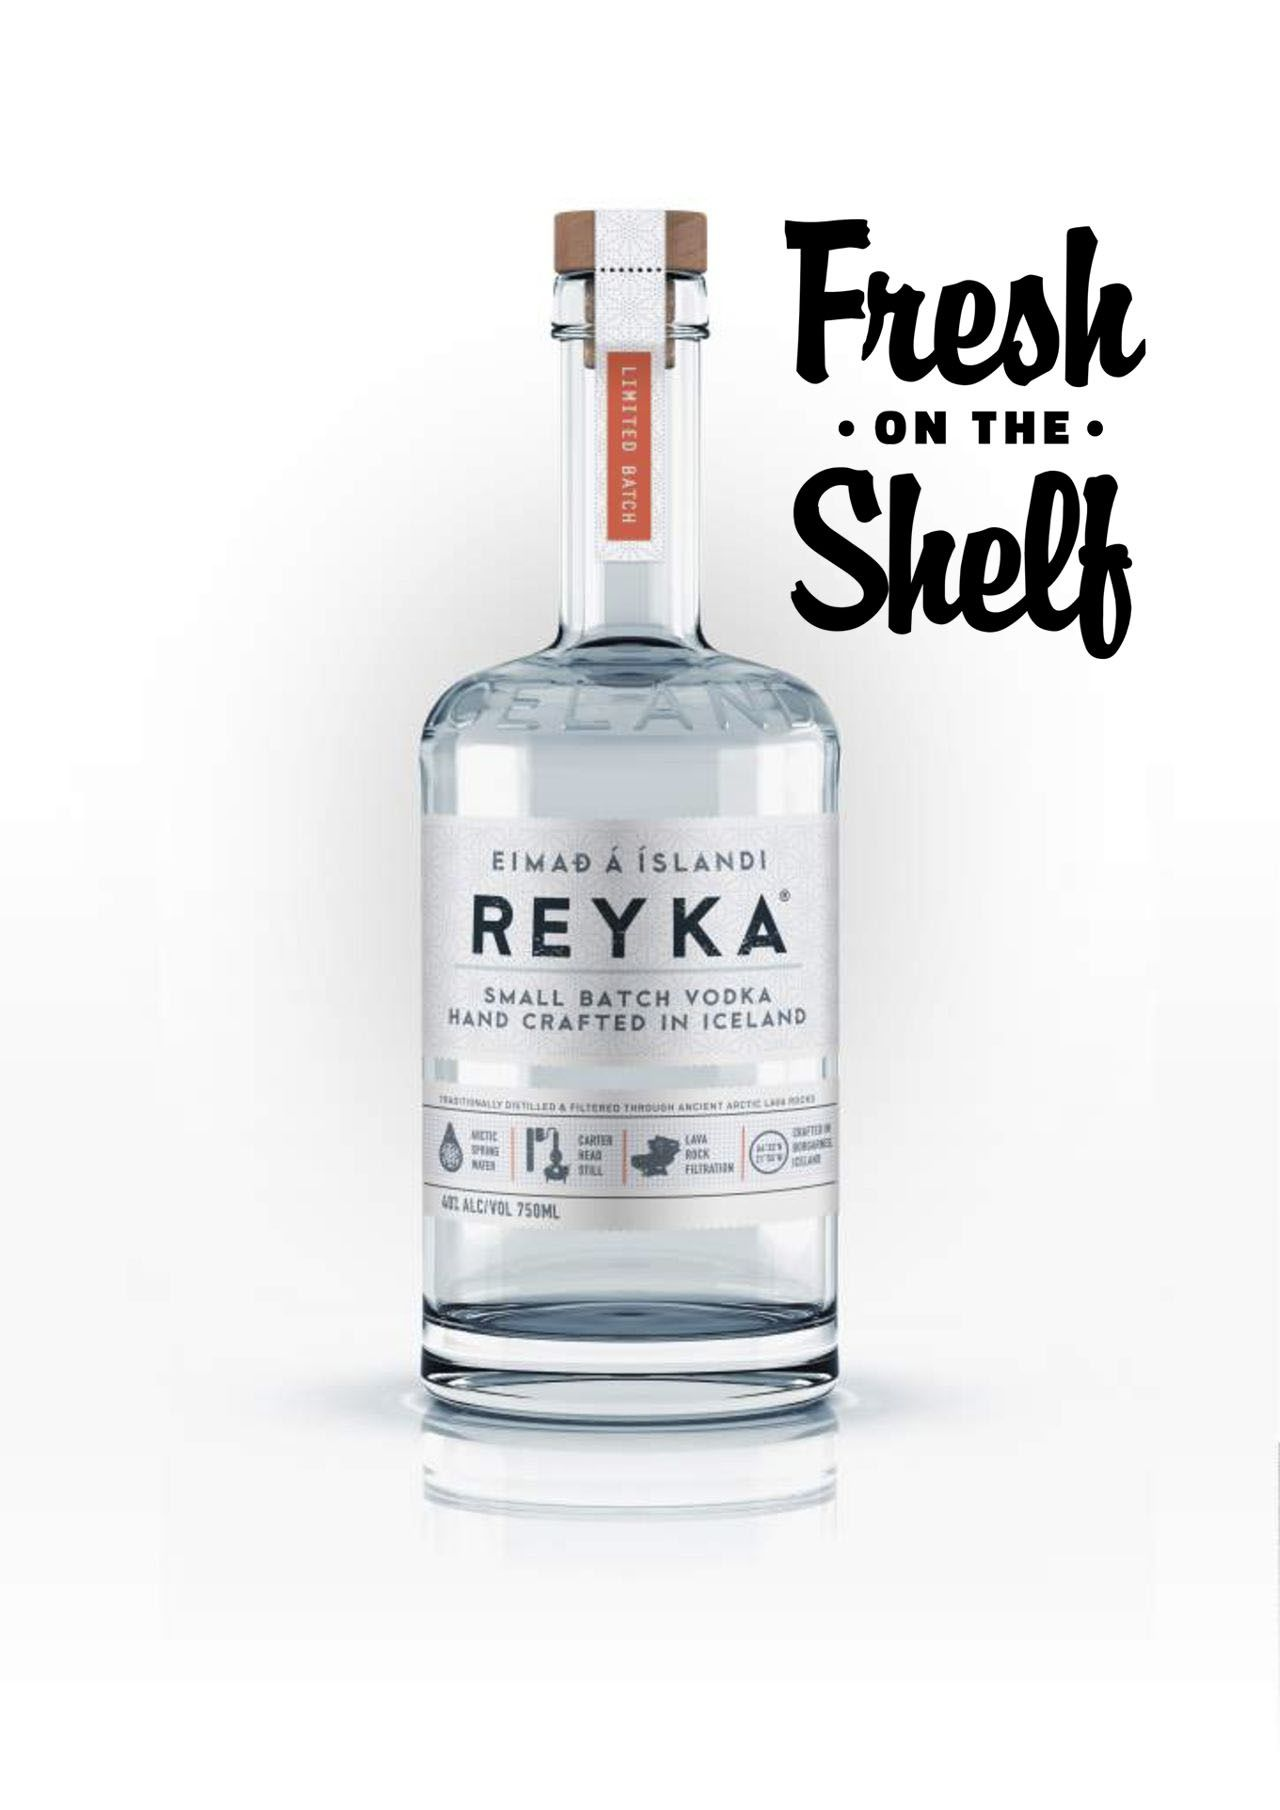 #freshontheshelf: Iceland's Reyka Vodka Now In South Africa photo